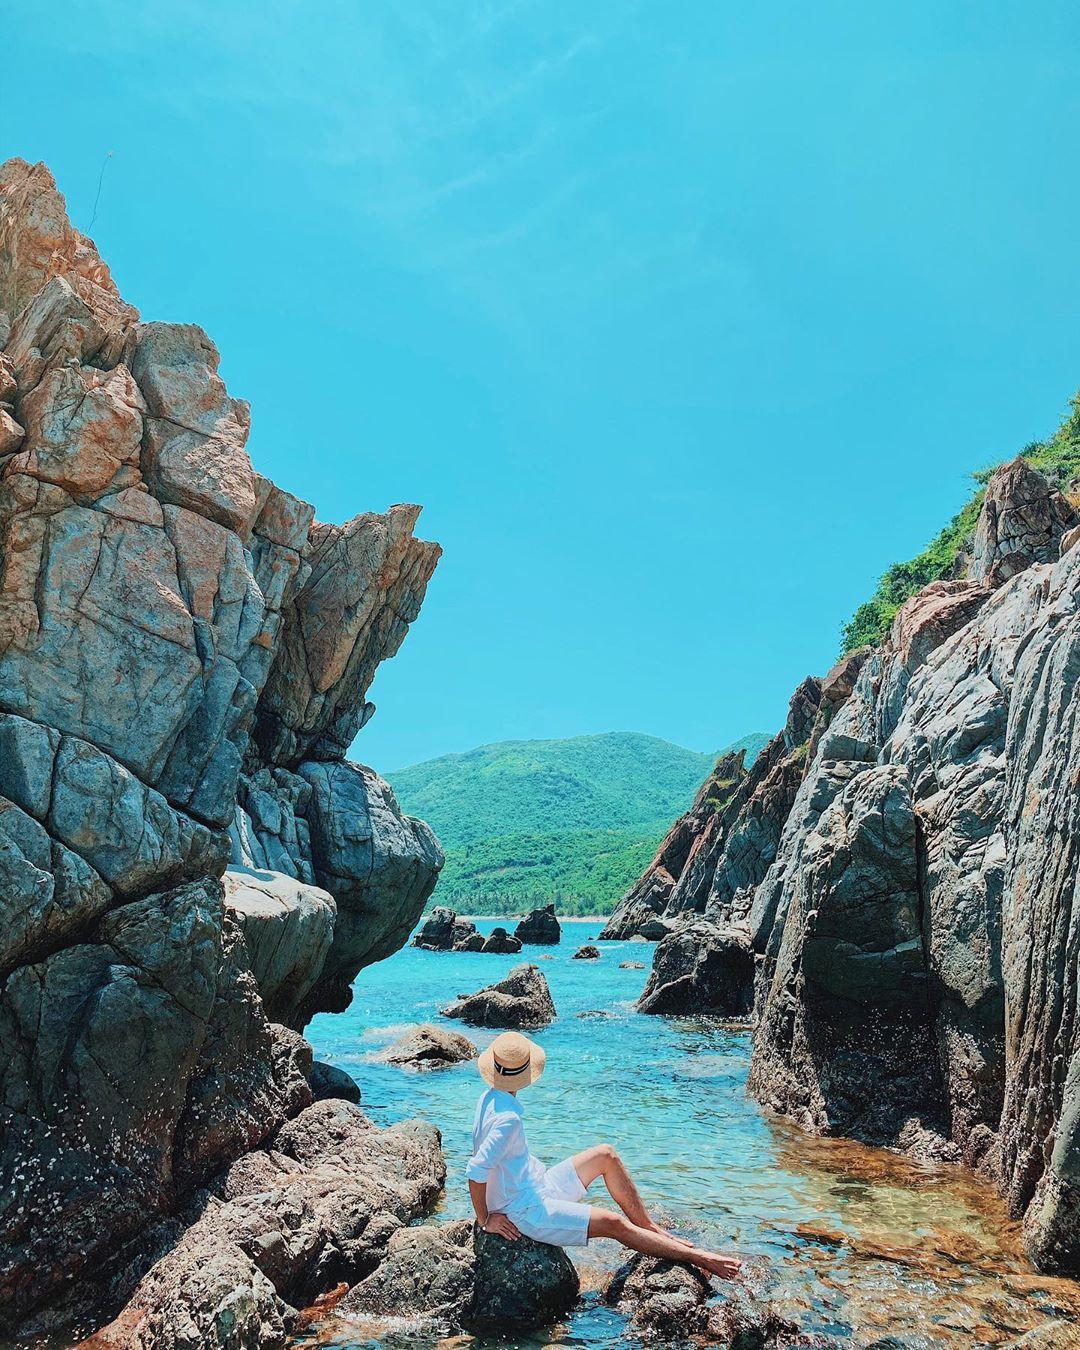 Kinh nghiệm du lịch Nha Trang - Hang Heo